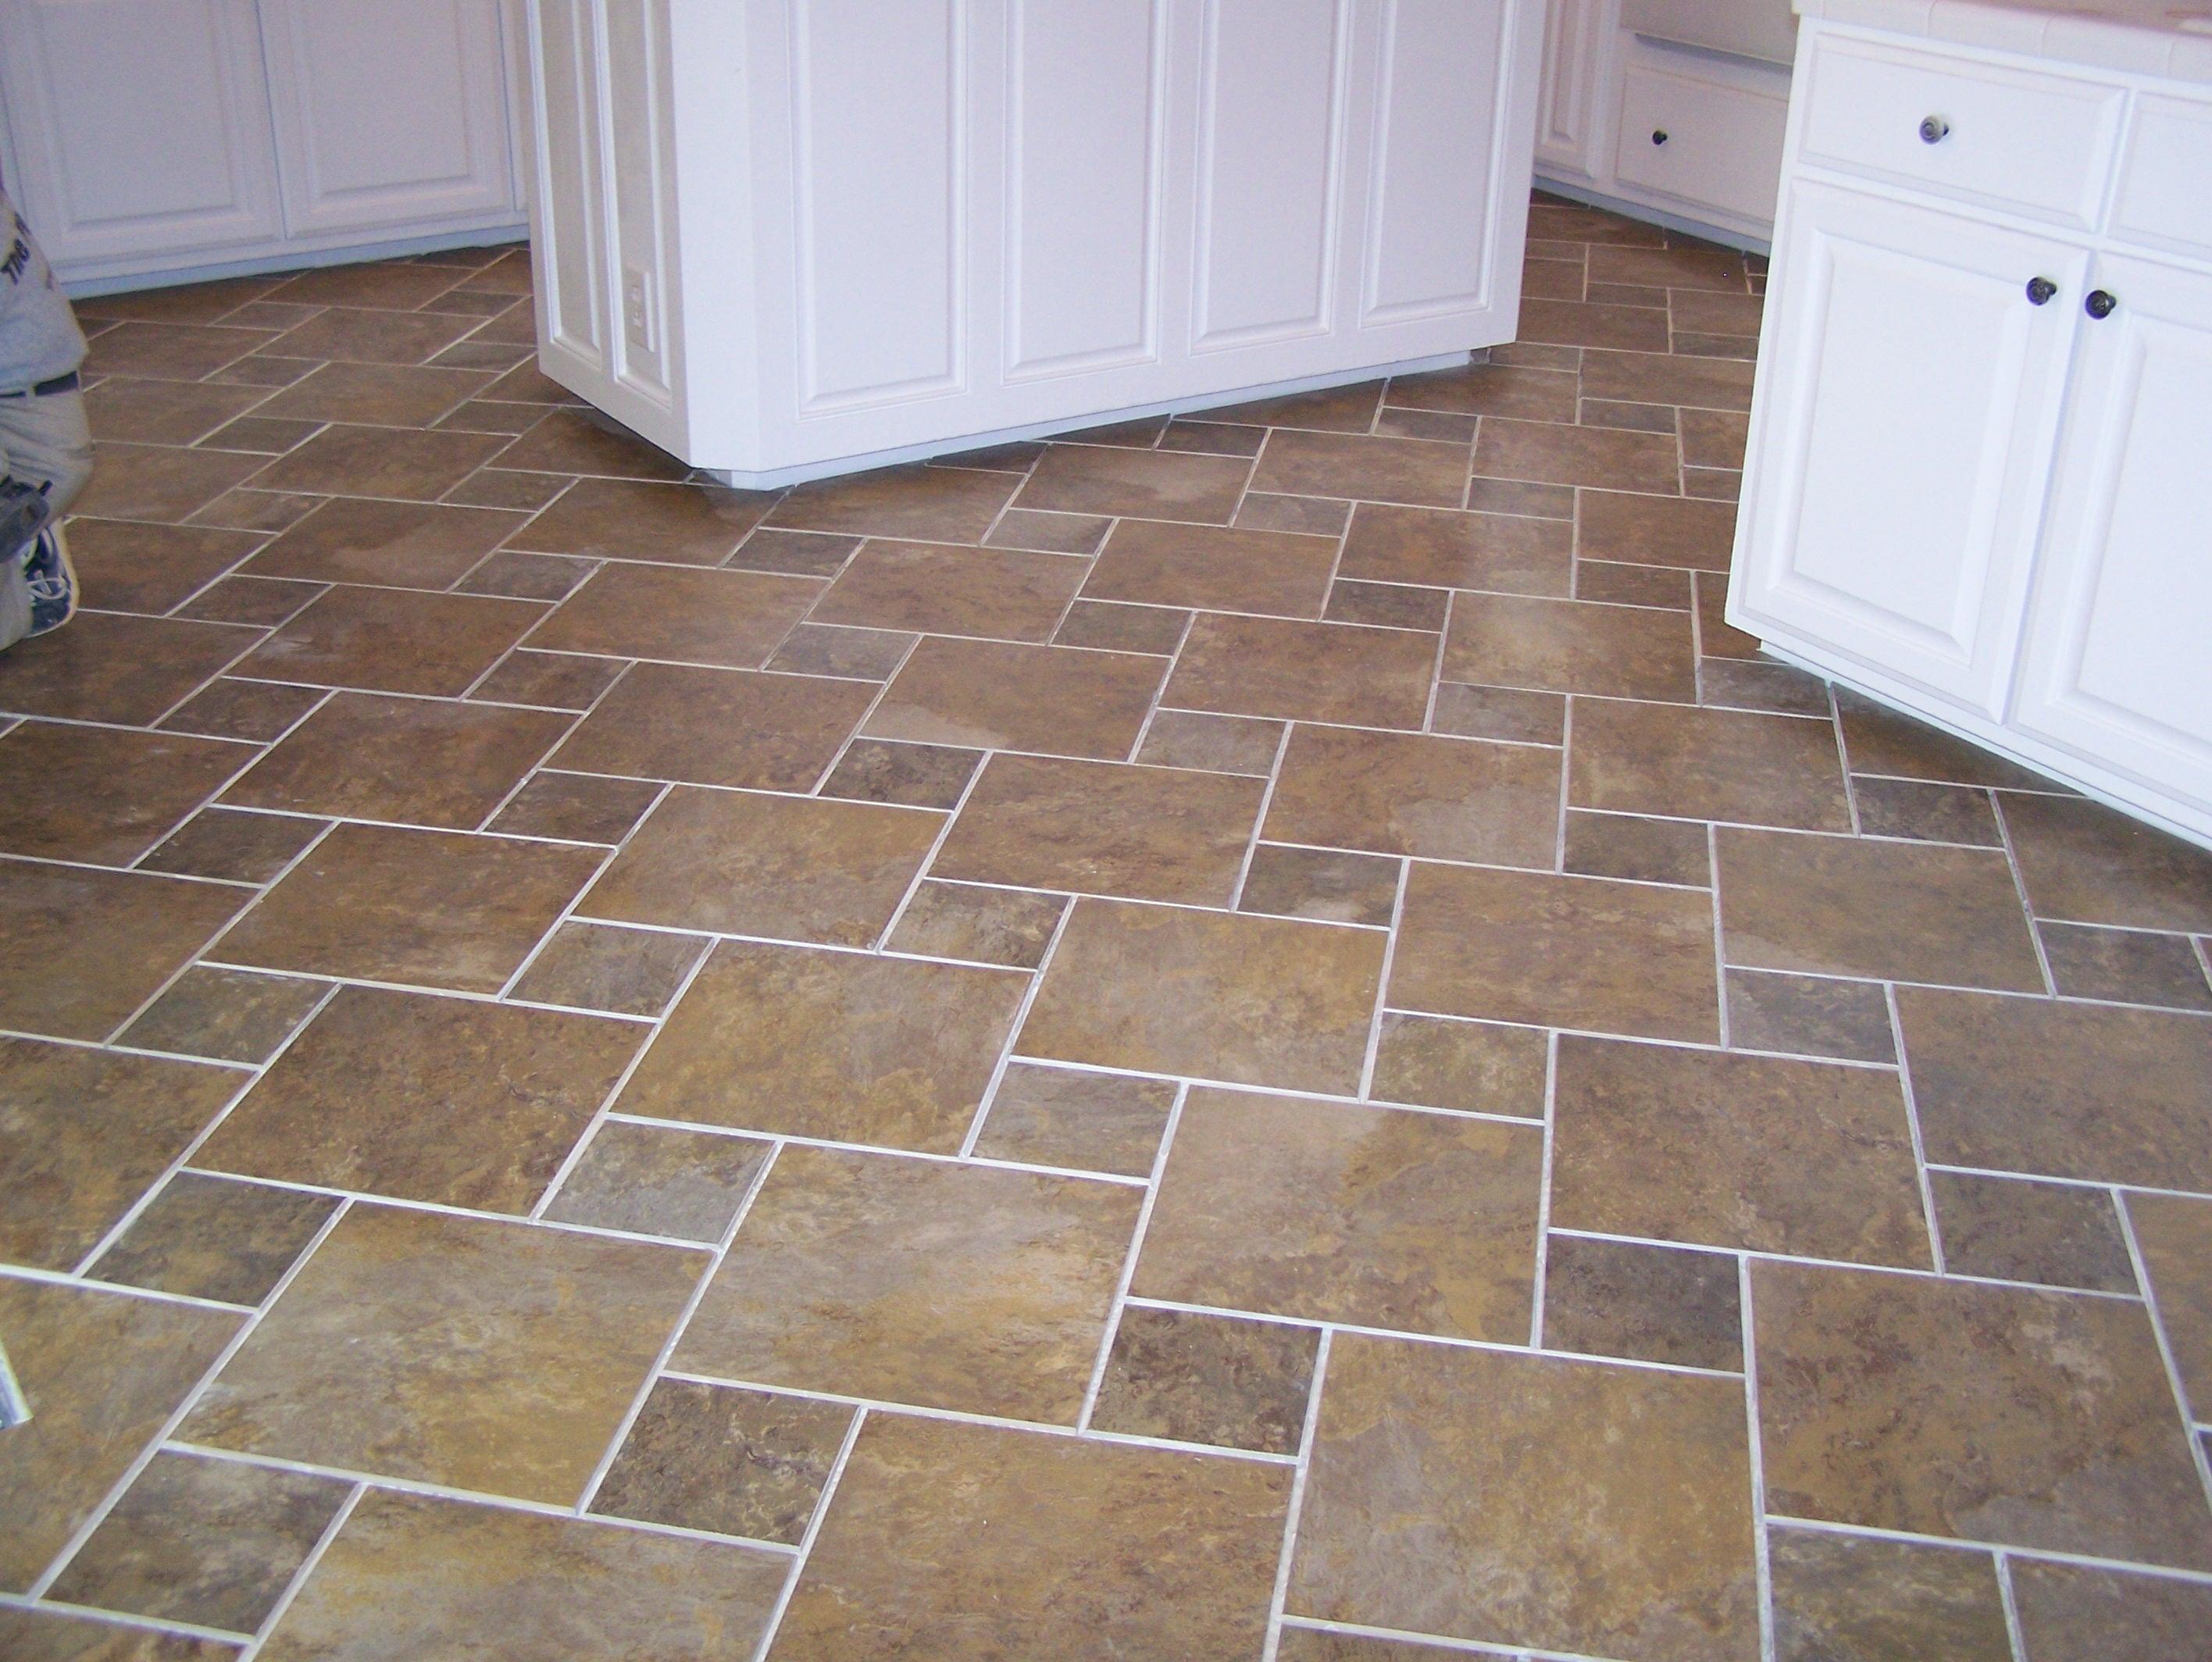 Flooring Install/Repair - Uncle John's Handyman Service